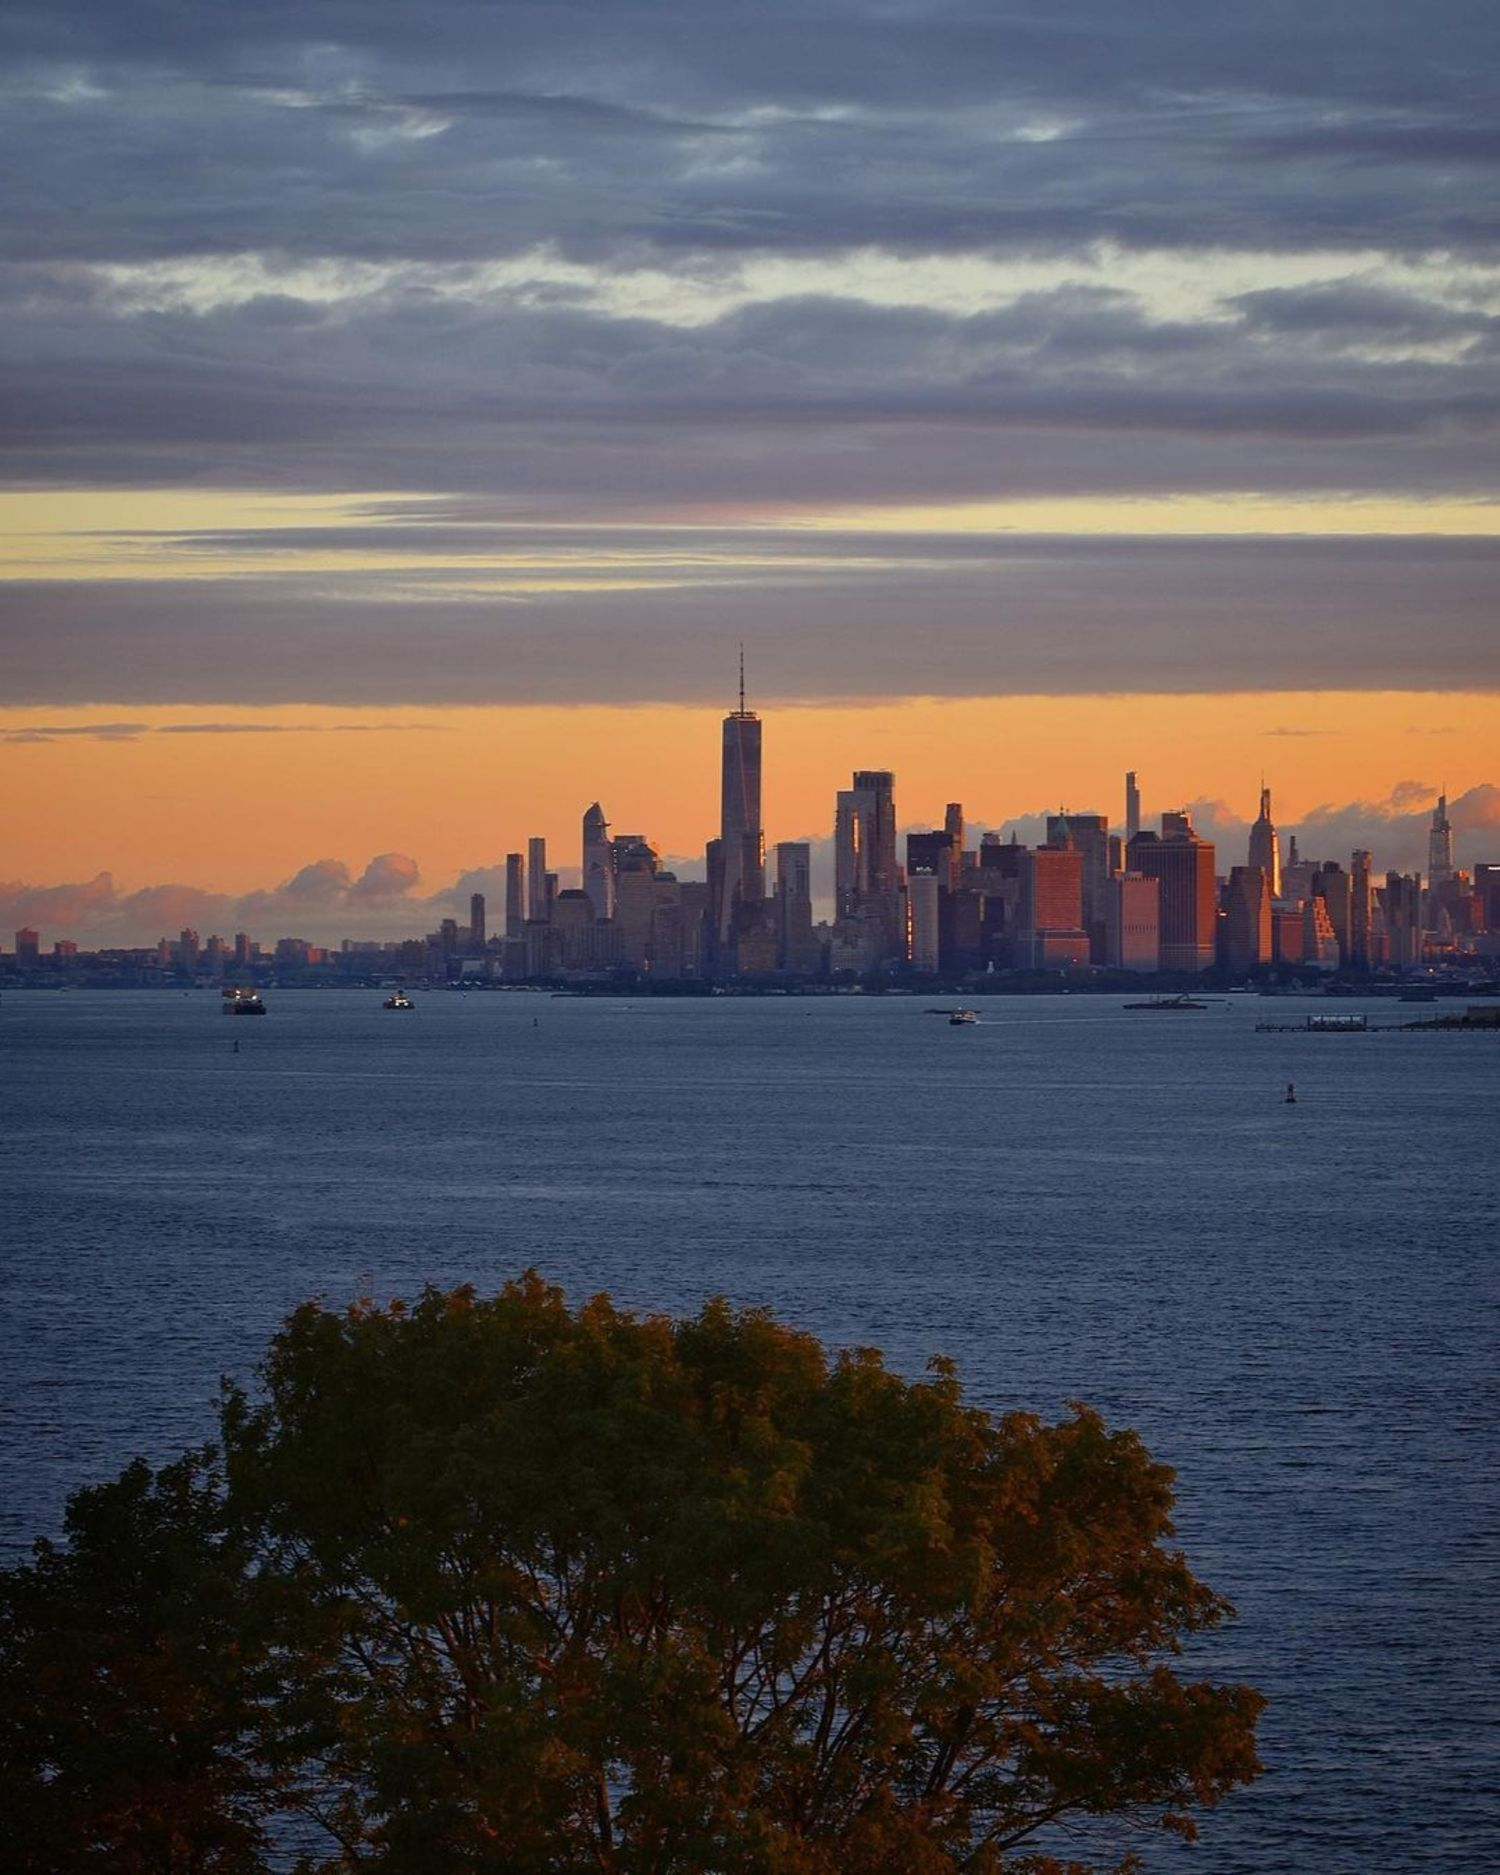 New York Harbor, New York